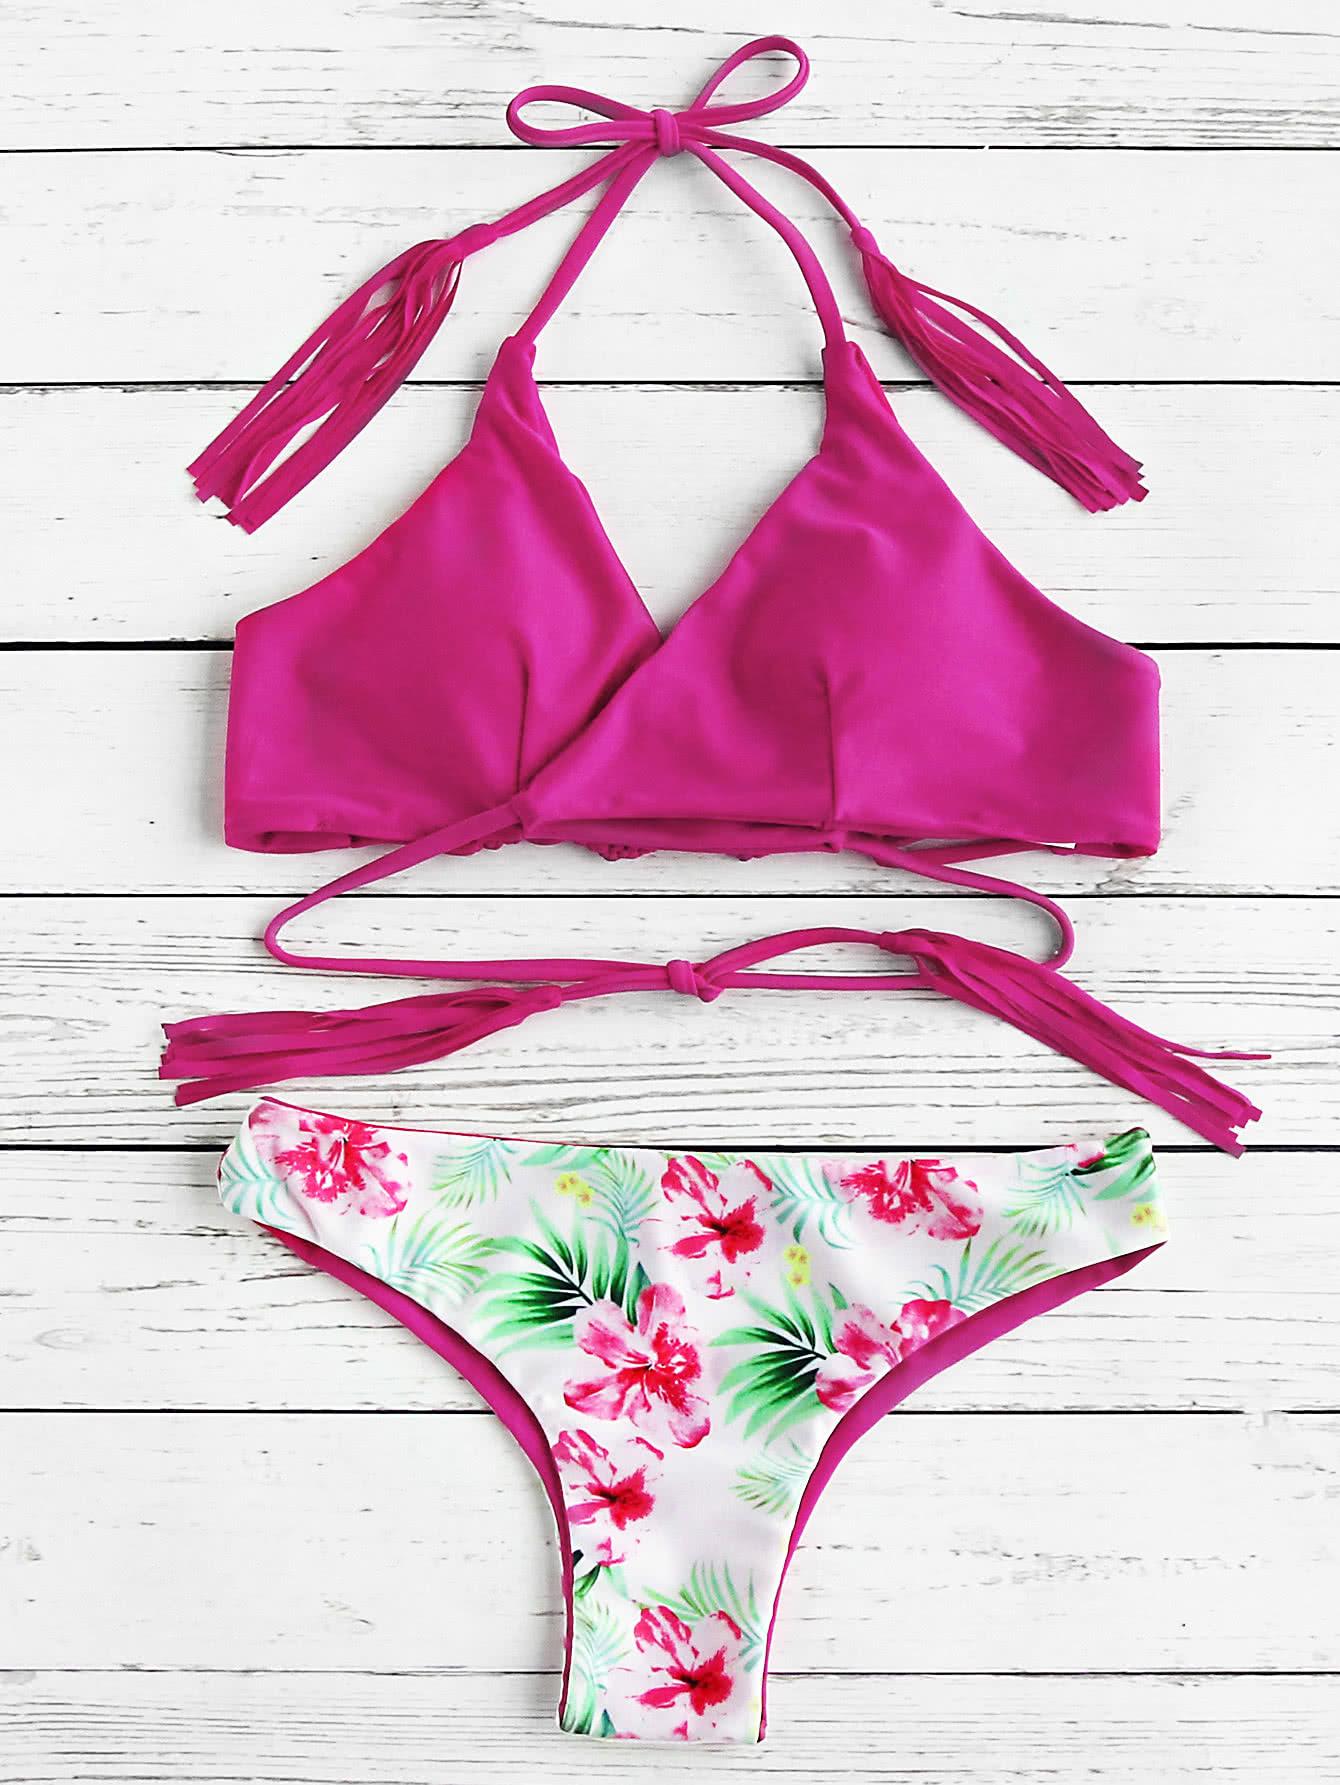 Calico Print Tassel Tie Bikini Set swimwear170531312